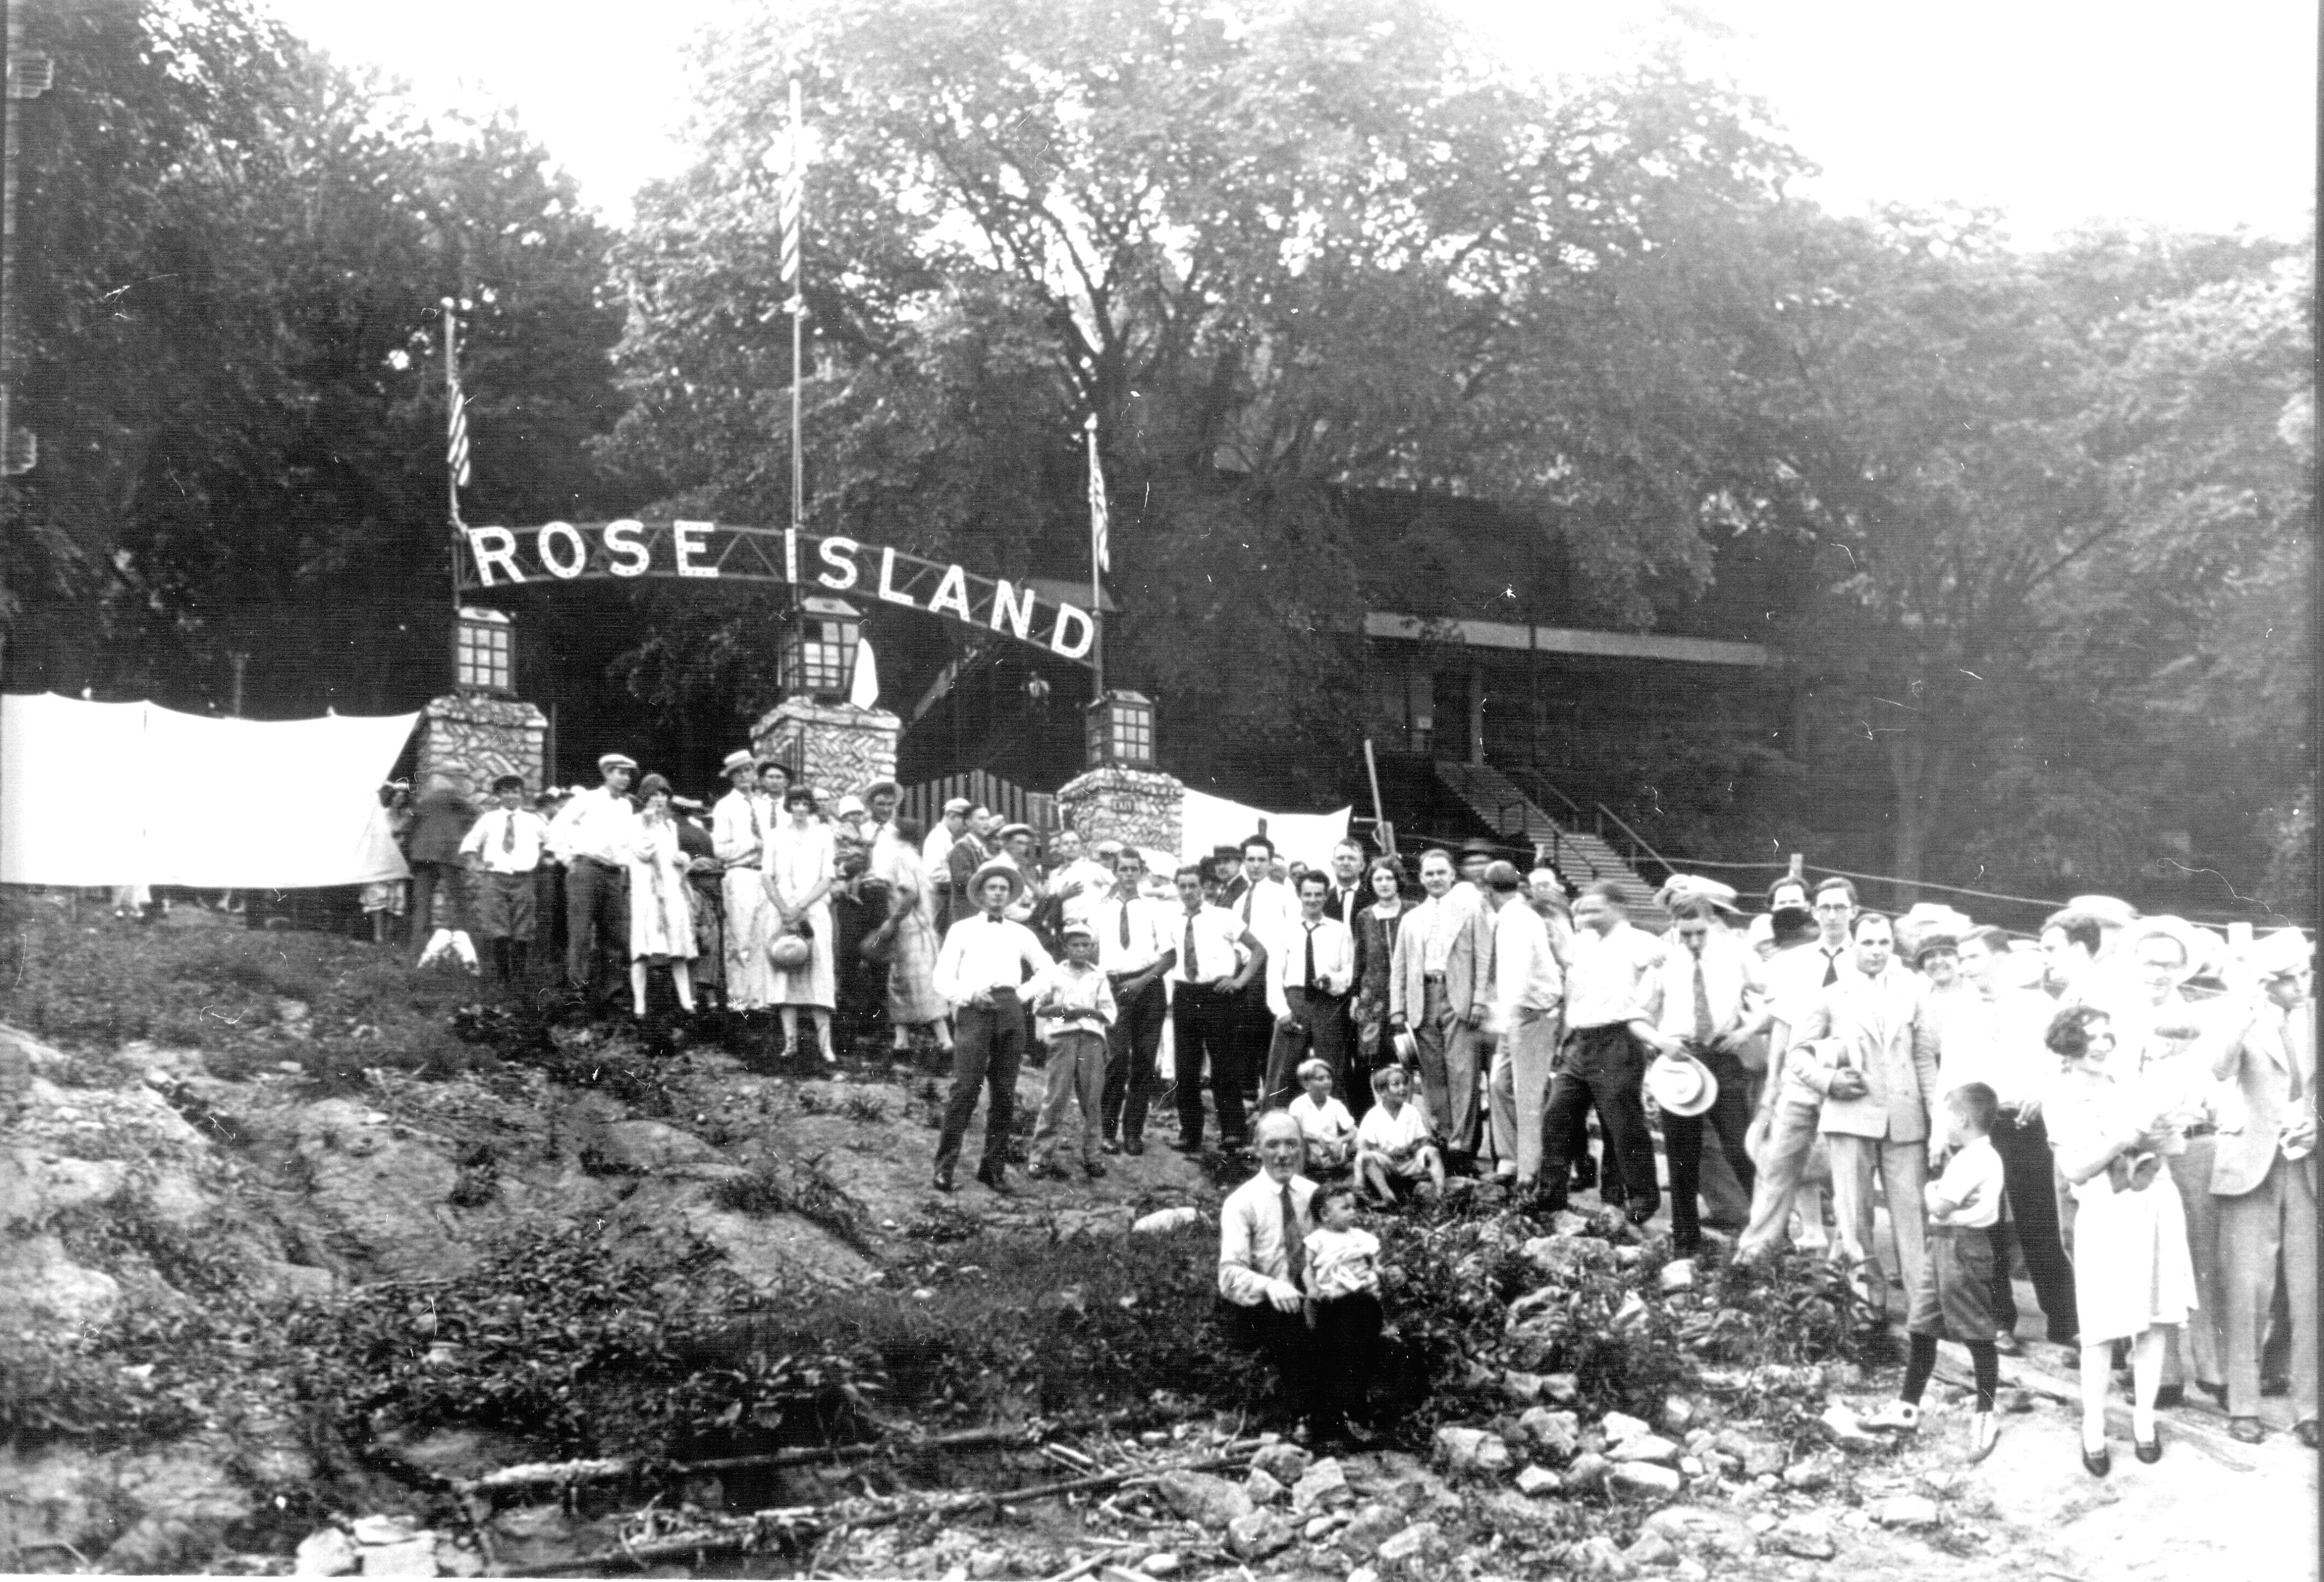 Rose Island 1